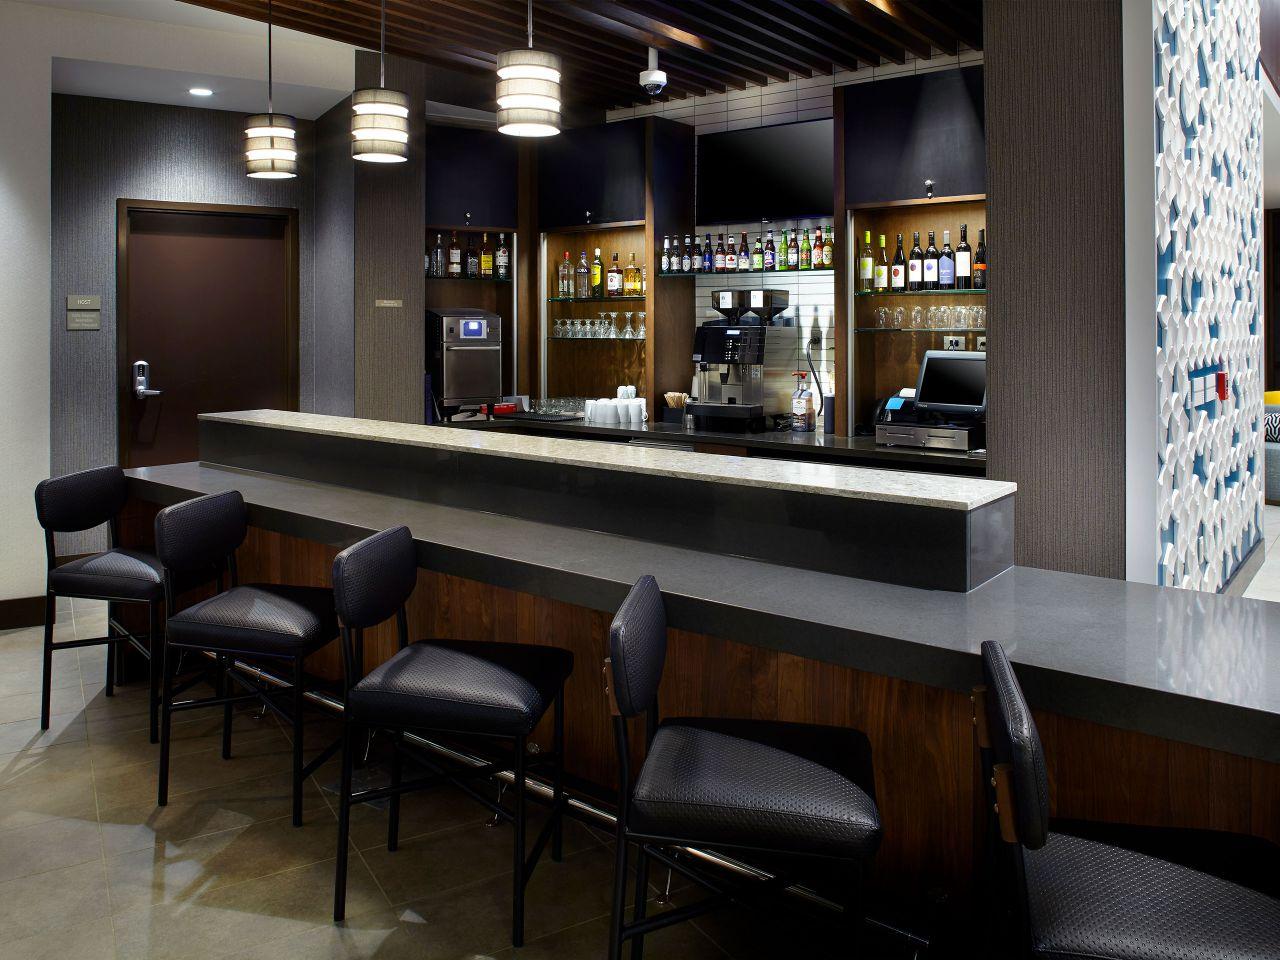 Hyatt Place Cleveland/Lyndhurst/Legacy Village Bar